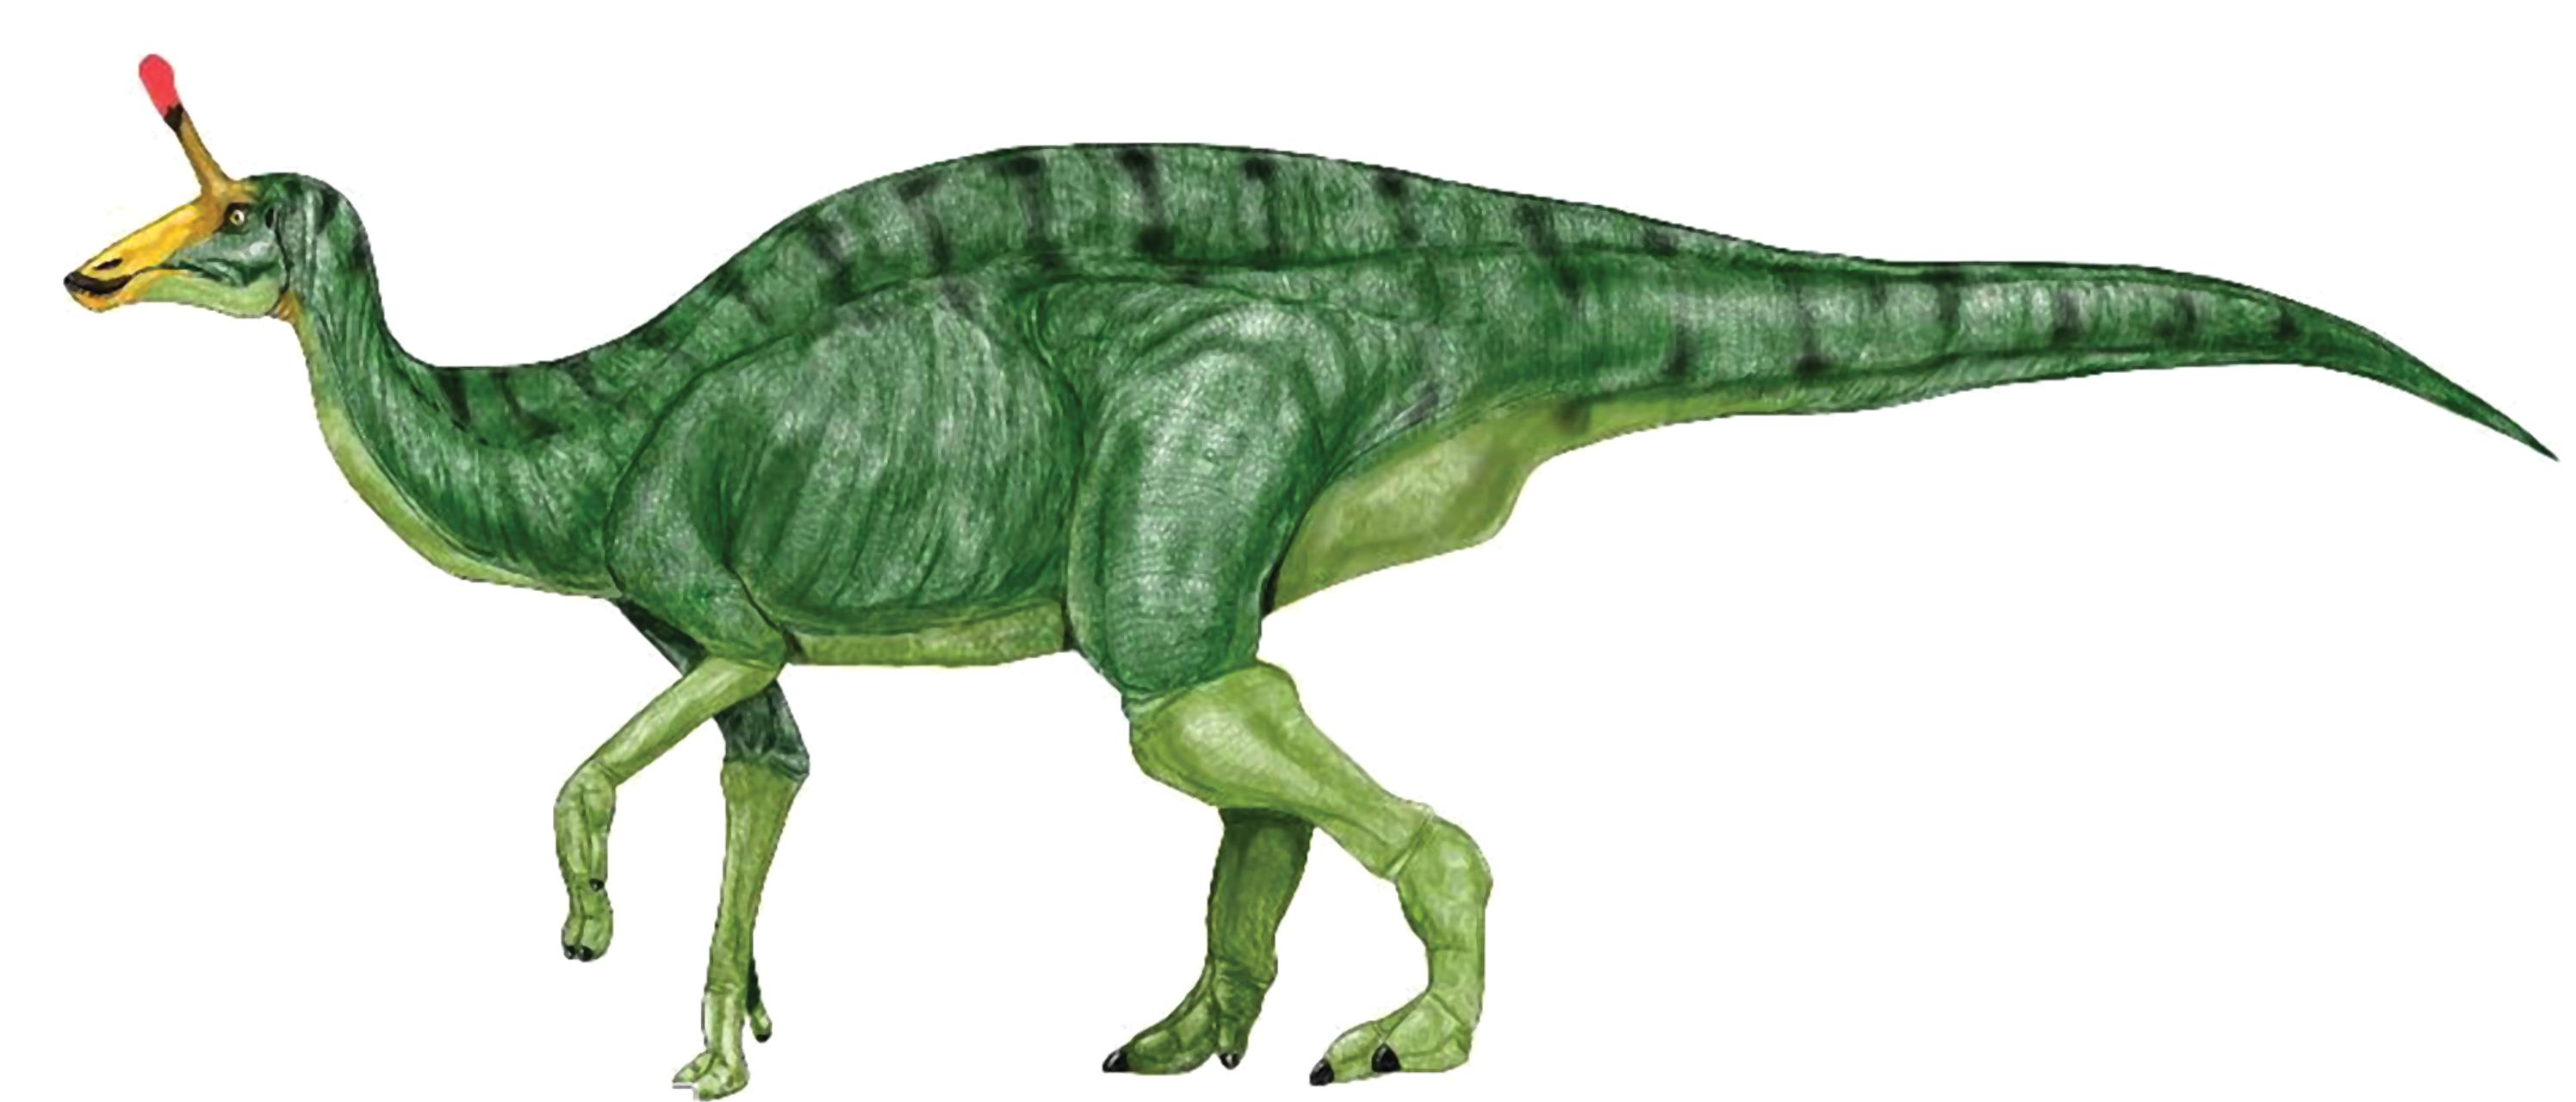 Dinosaur clip art free. Green clipart t rex